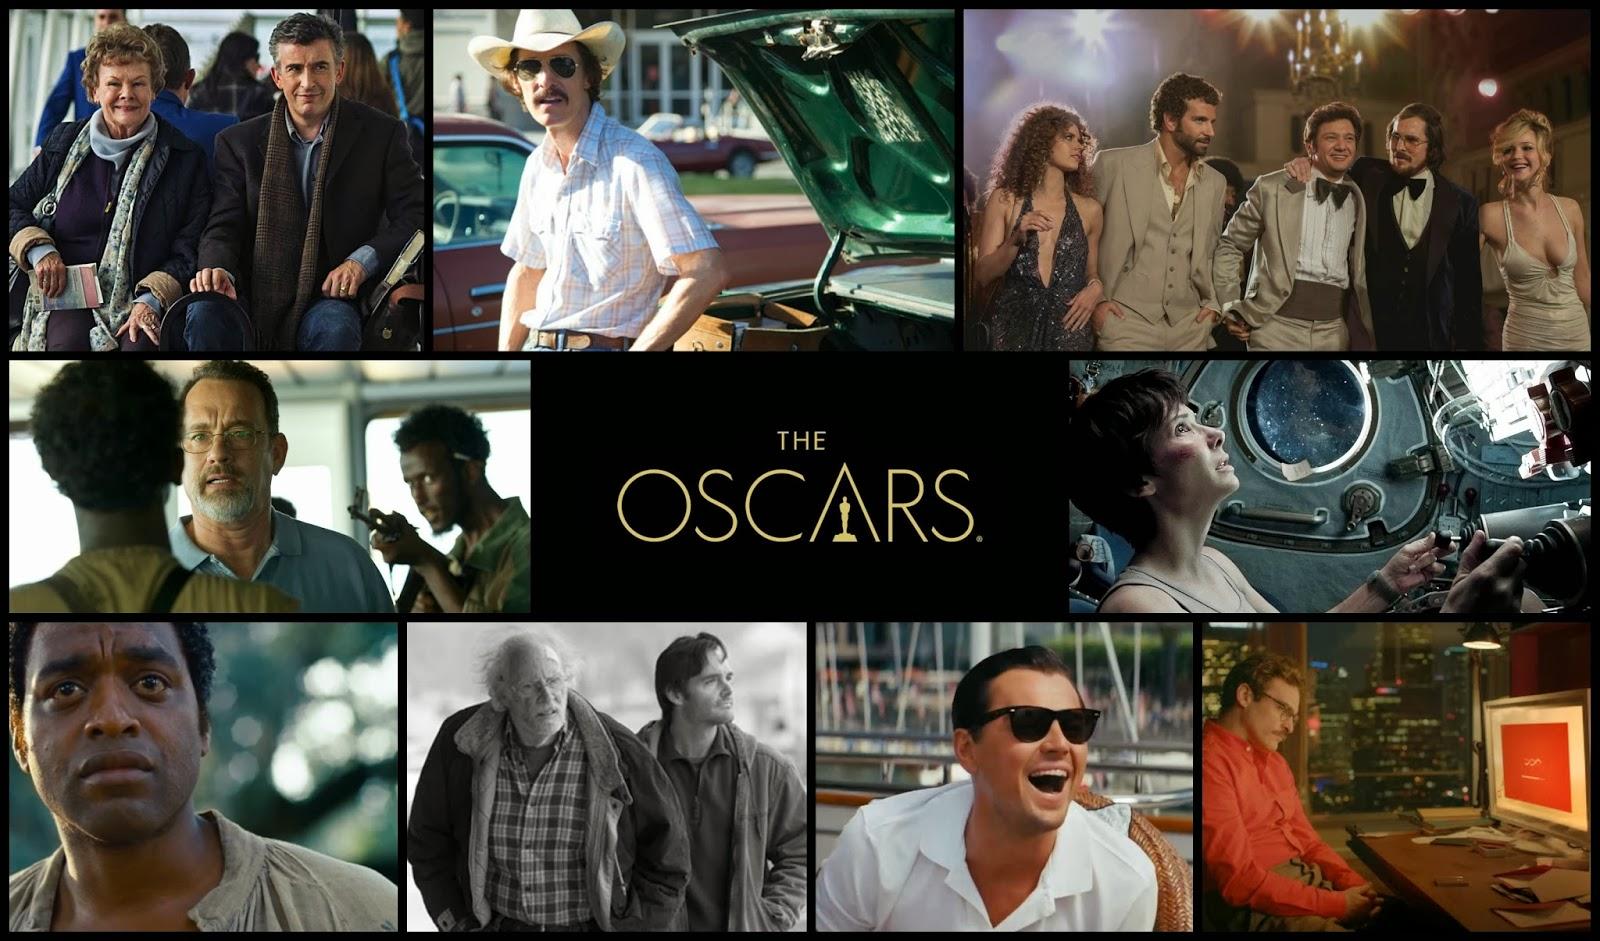 "<img src=http://""theoscars.jpg""?w=754&h=443 alt=""oscar movies"">"